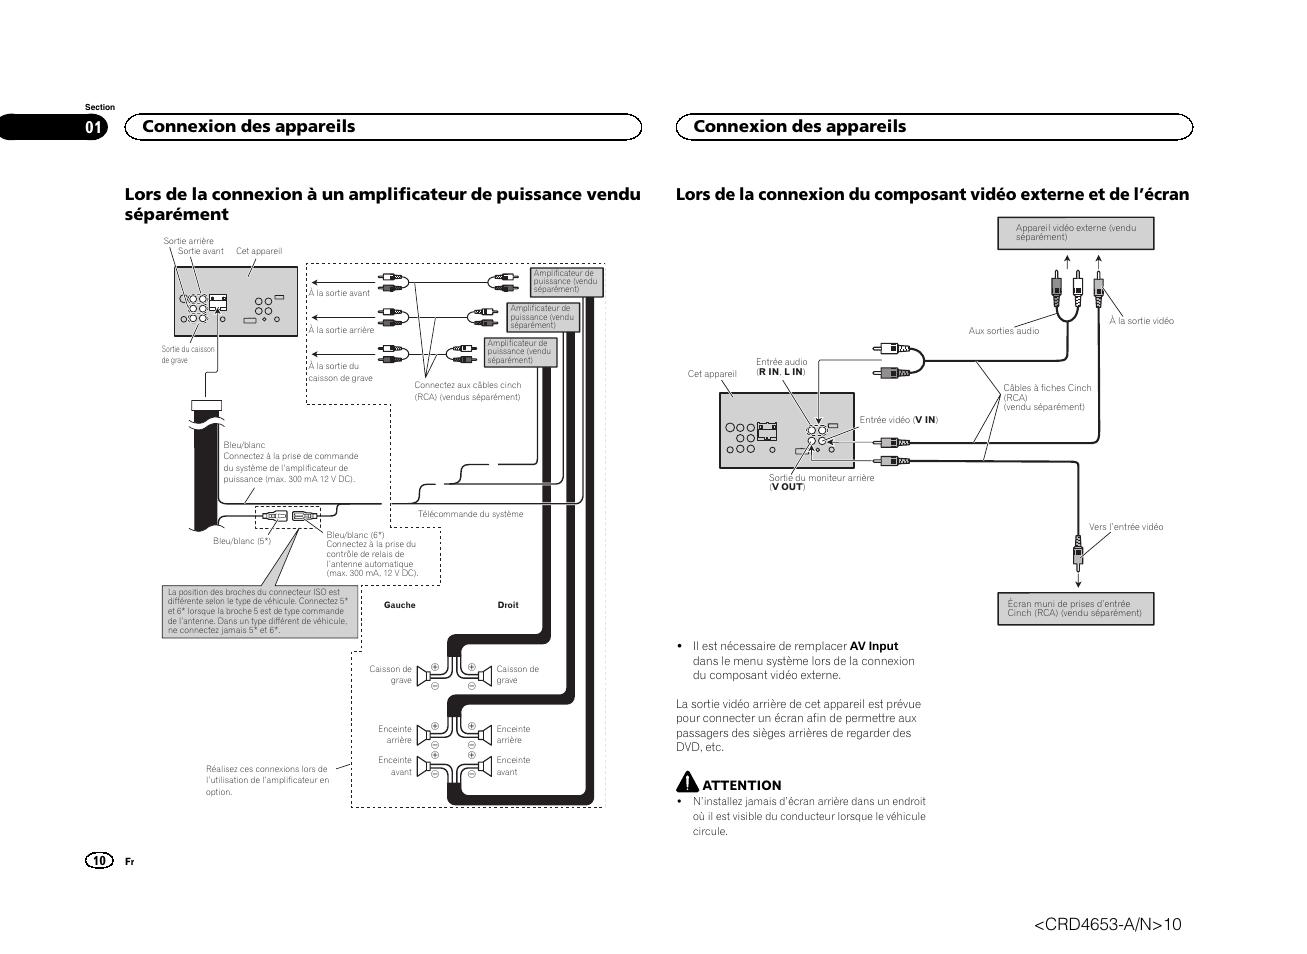 hight resolution of avh x1500 dvd wiring extended wiring diagram wiring diagram for a pioneer avh x1500 dvd player